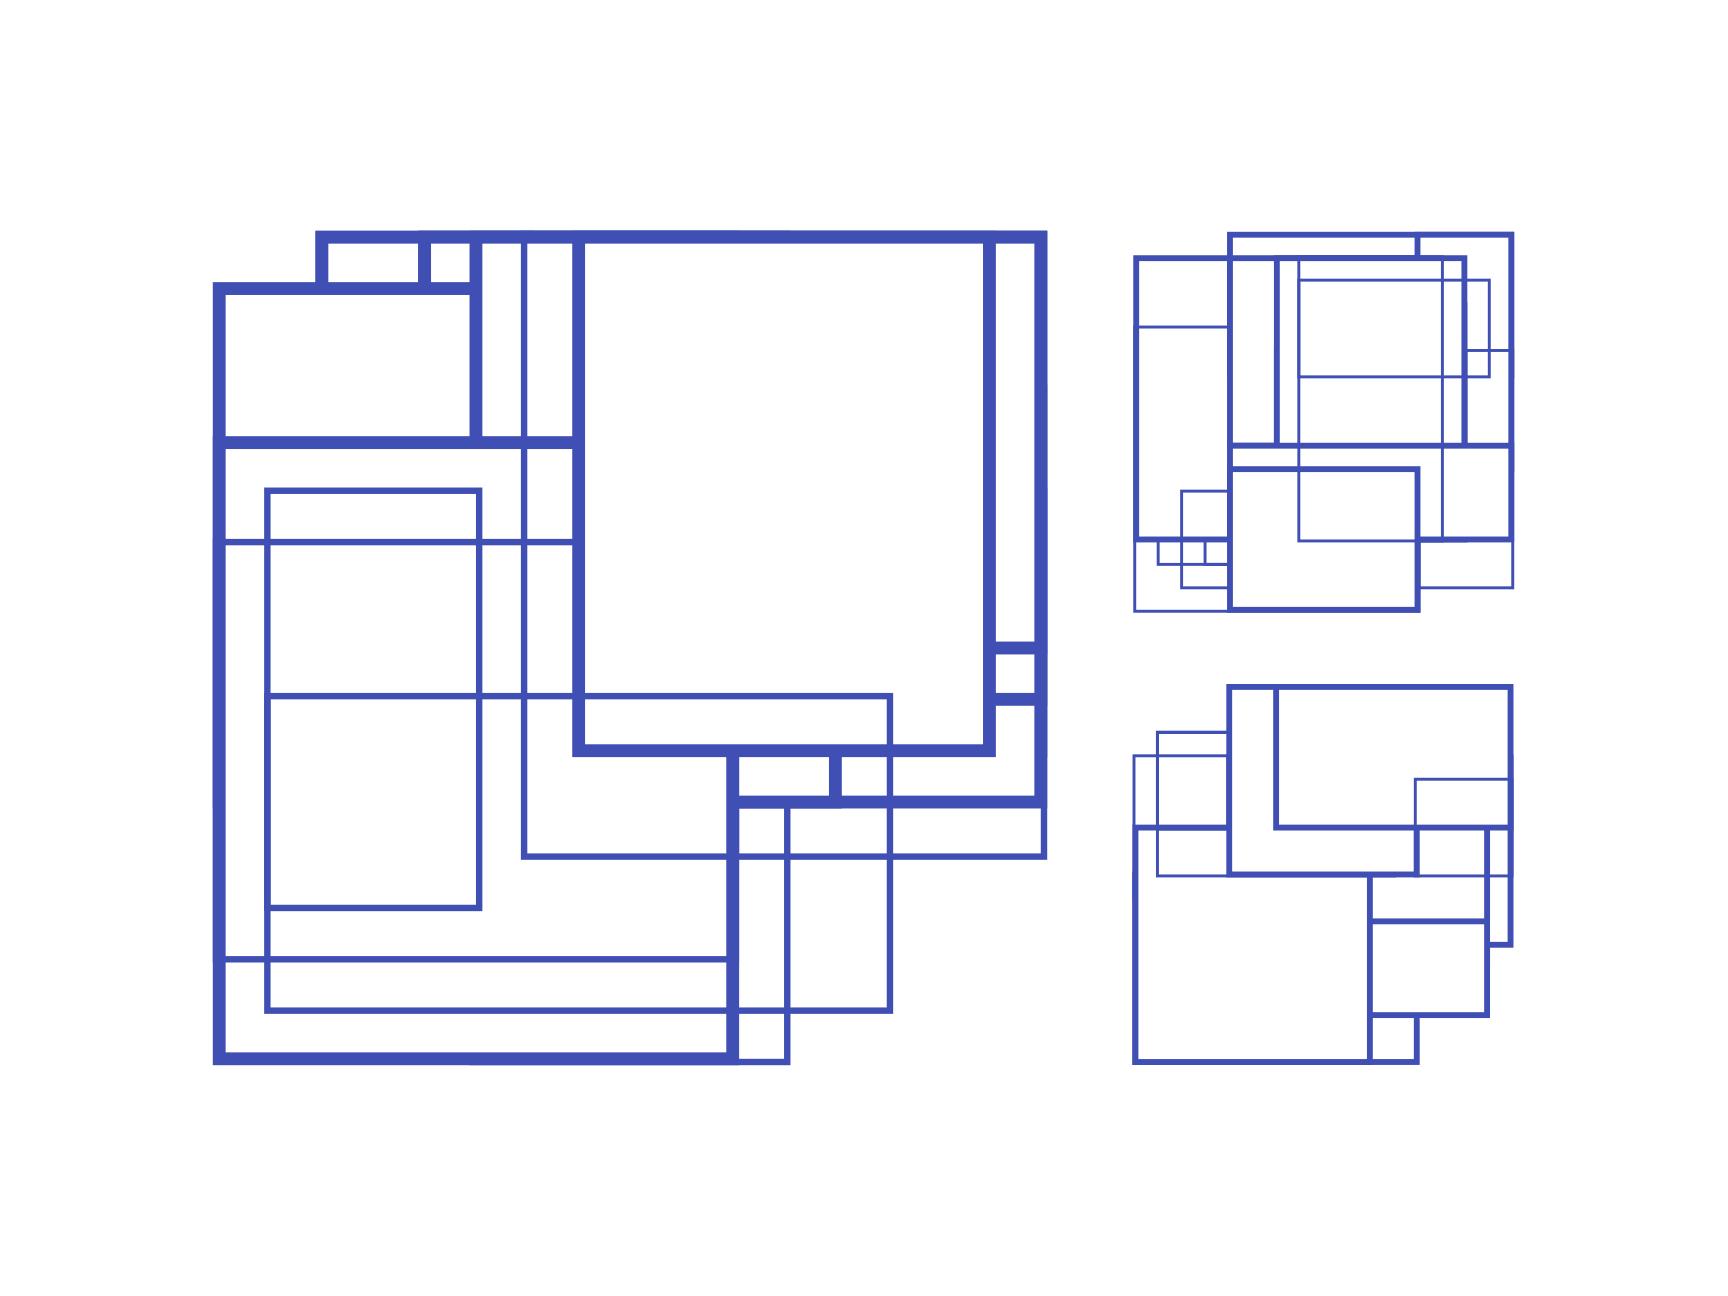 plan74.jpg